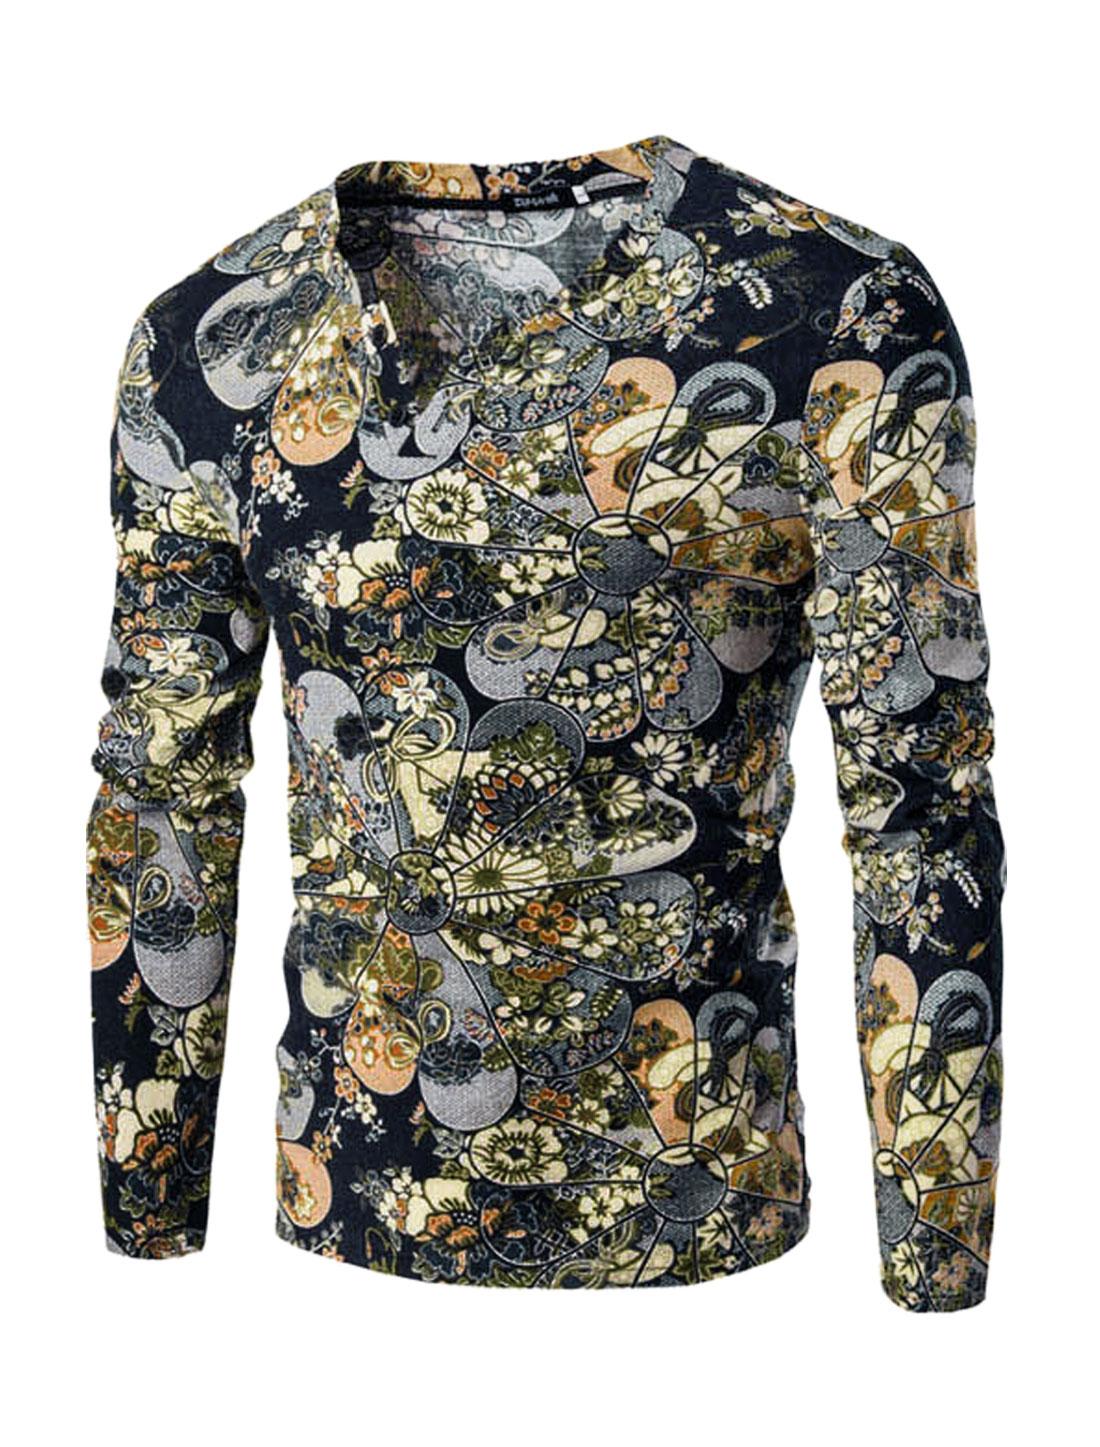 Men Split Neck Long Sleeves Floral Prints Slim Fit T-shirt Blue M